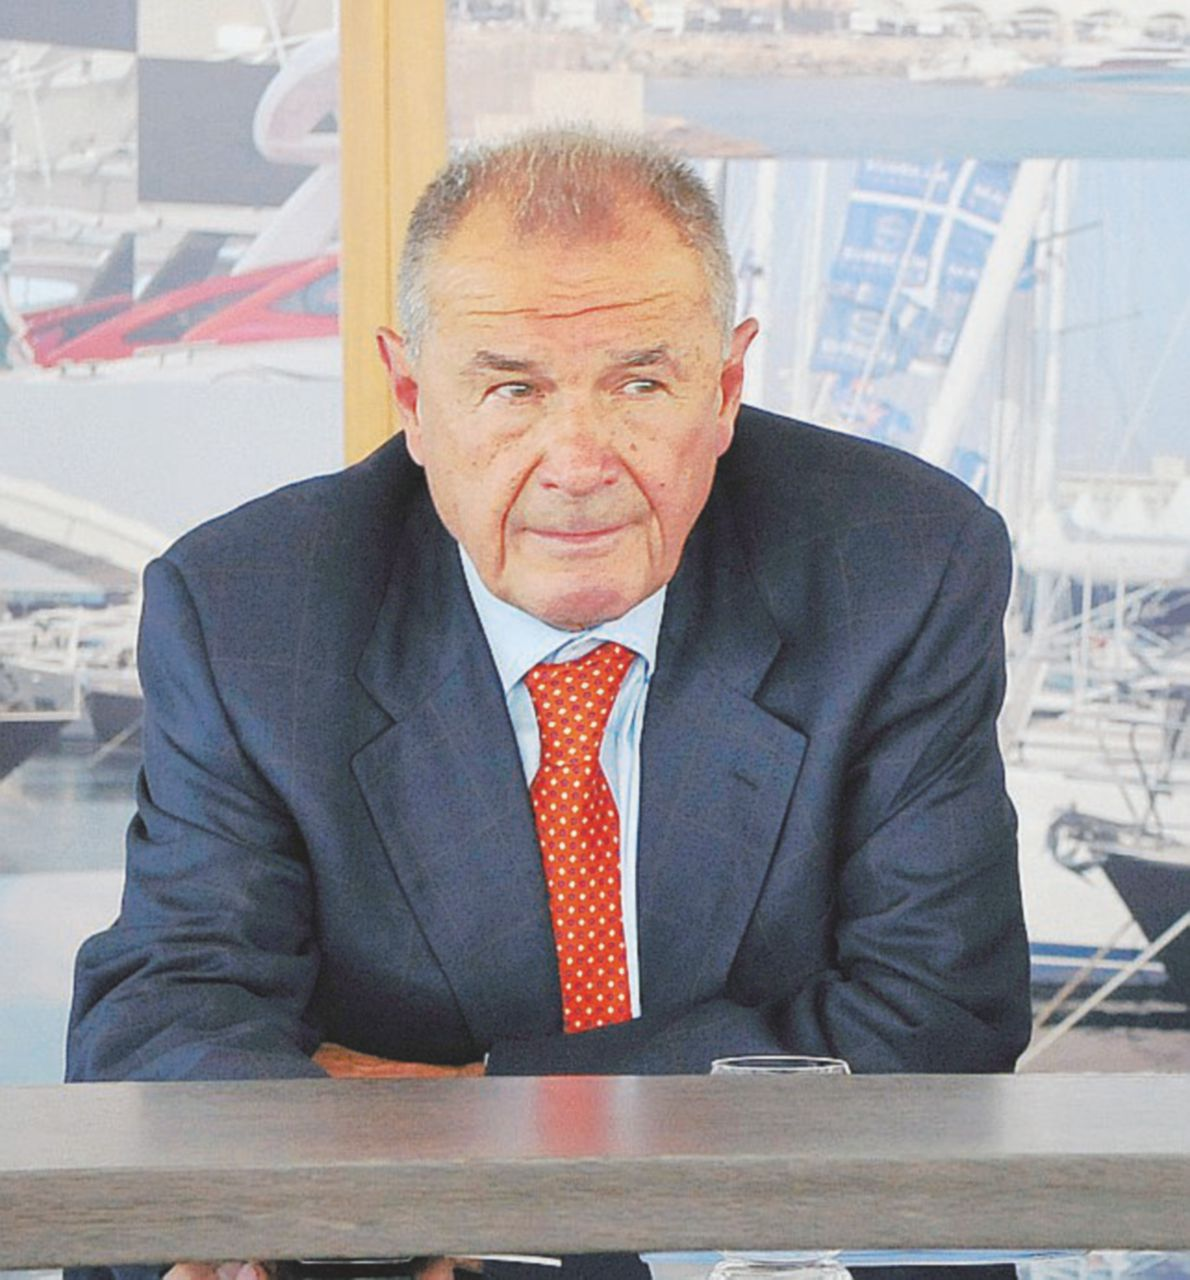 L'ex senatore di B. che in piazza santifica l'evasione